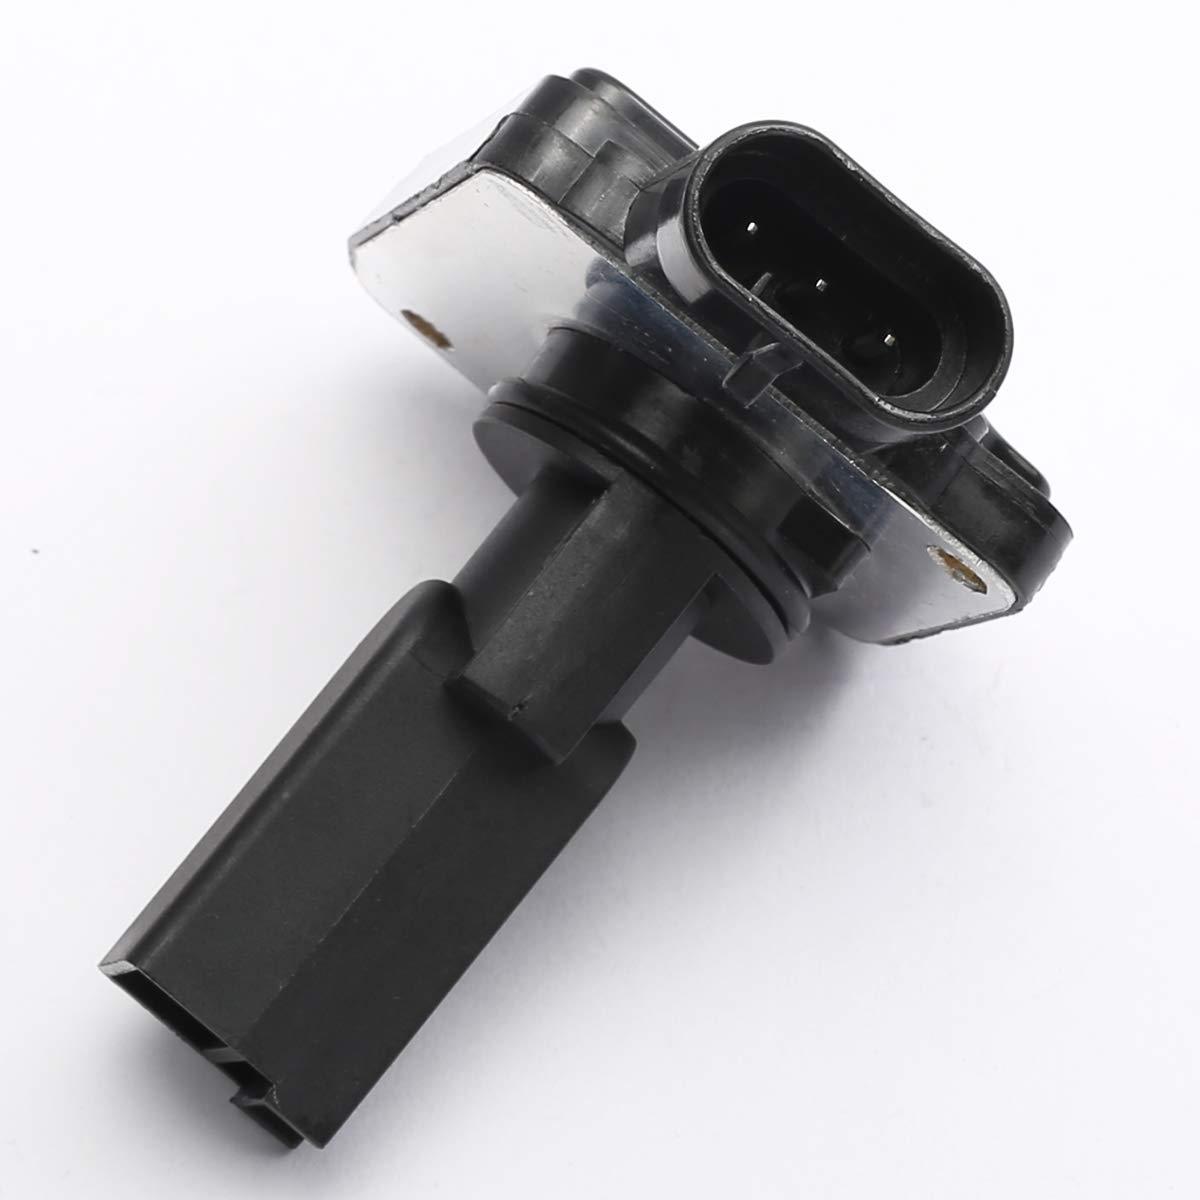 2000-2005 Impala Mass Air Flow Meter Sensor MAF 12568877 19179715 Replacement for Buick Chevrolet Oldsmobile Pontiac 3.8L 3Pin 1999-2005 Lesabre 1999-2005 Bonneville 1999-2002 Camaro